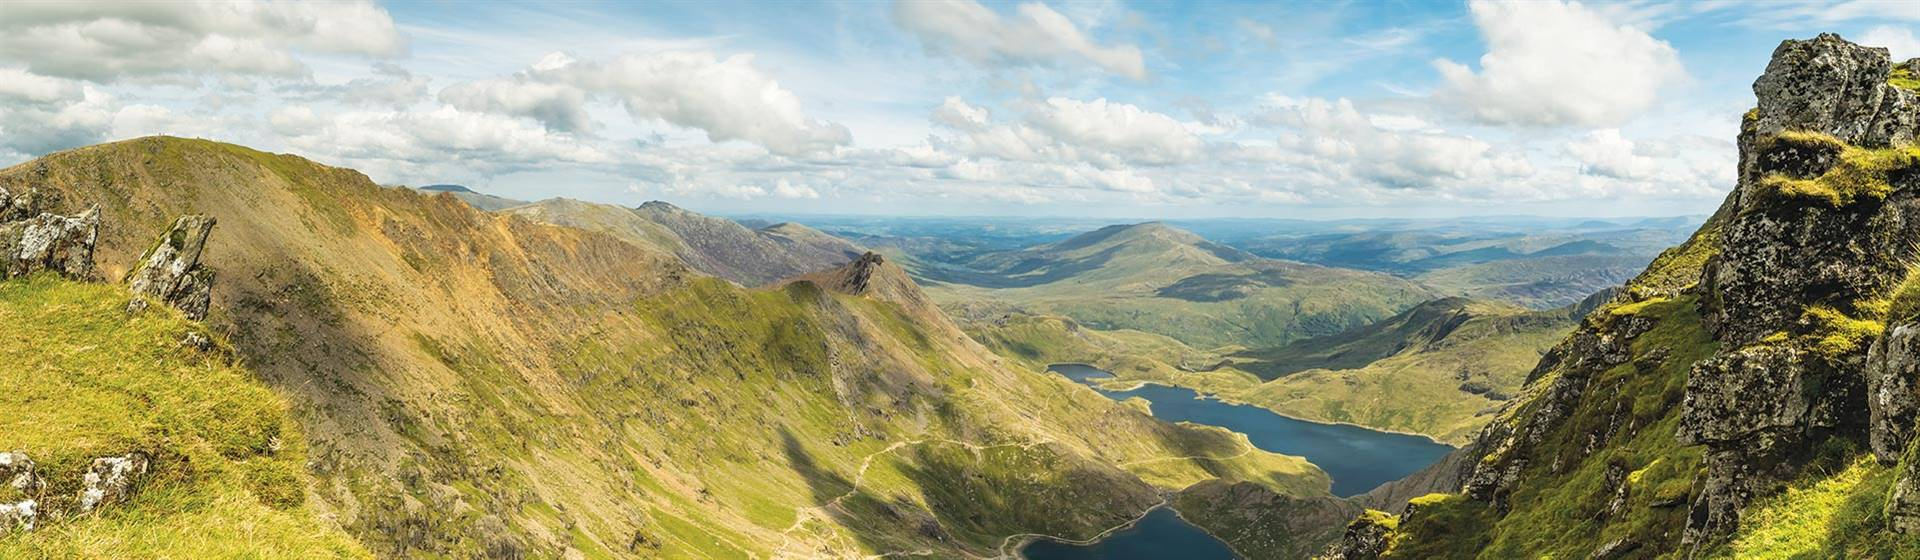 Sights of Snowdonia